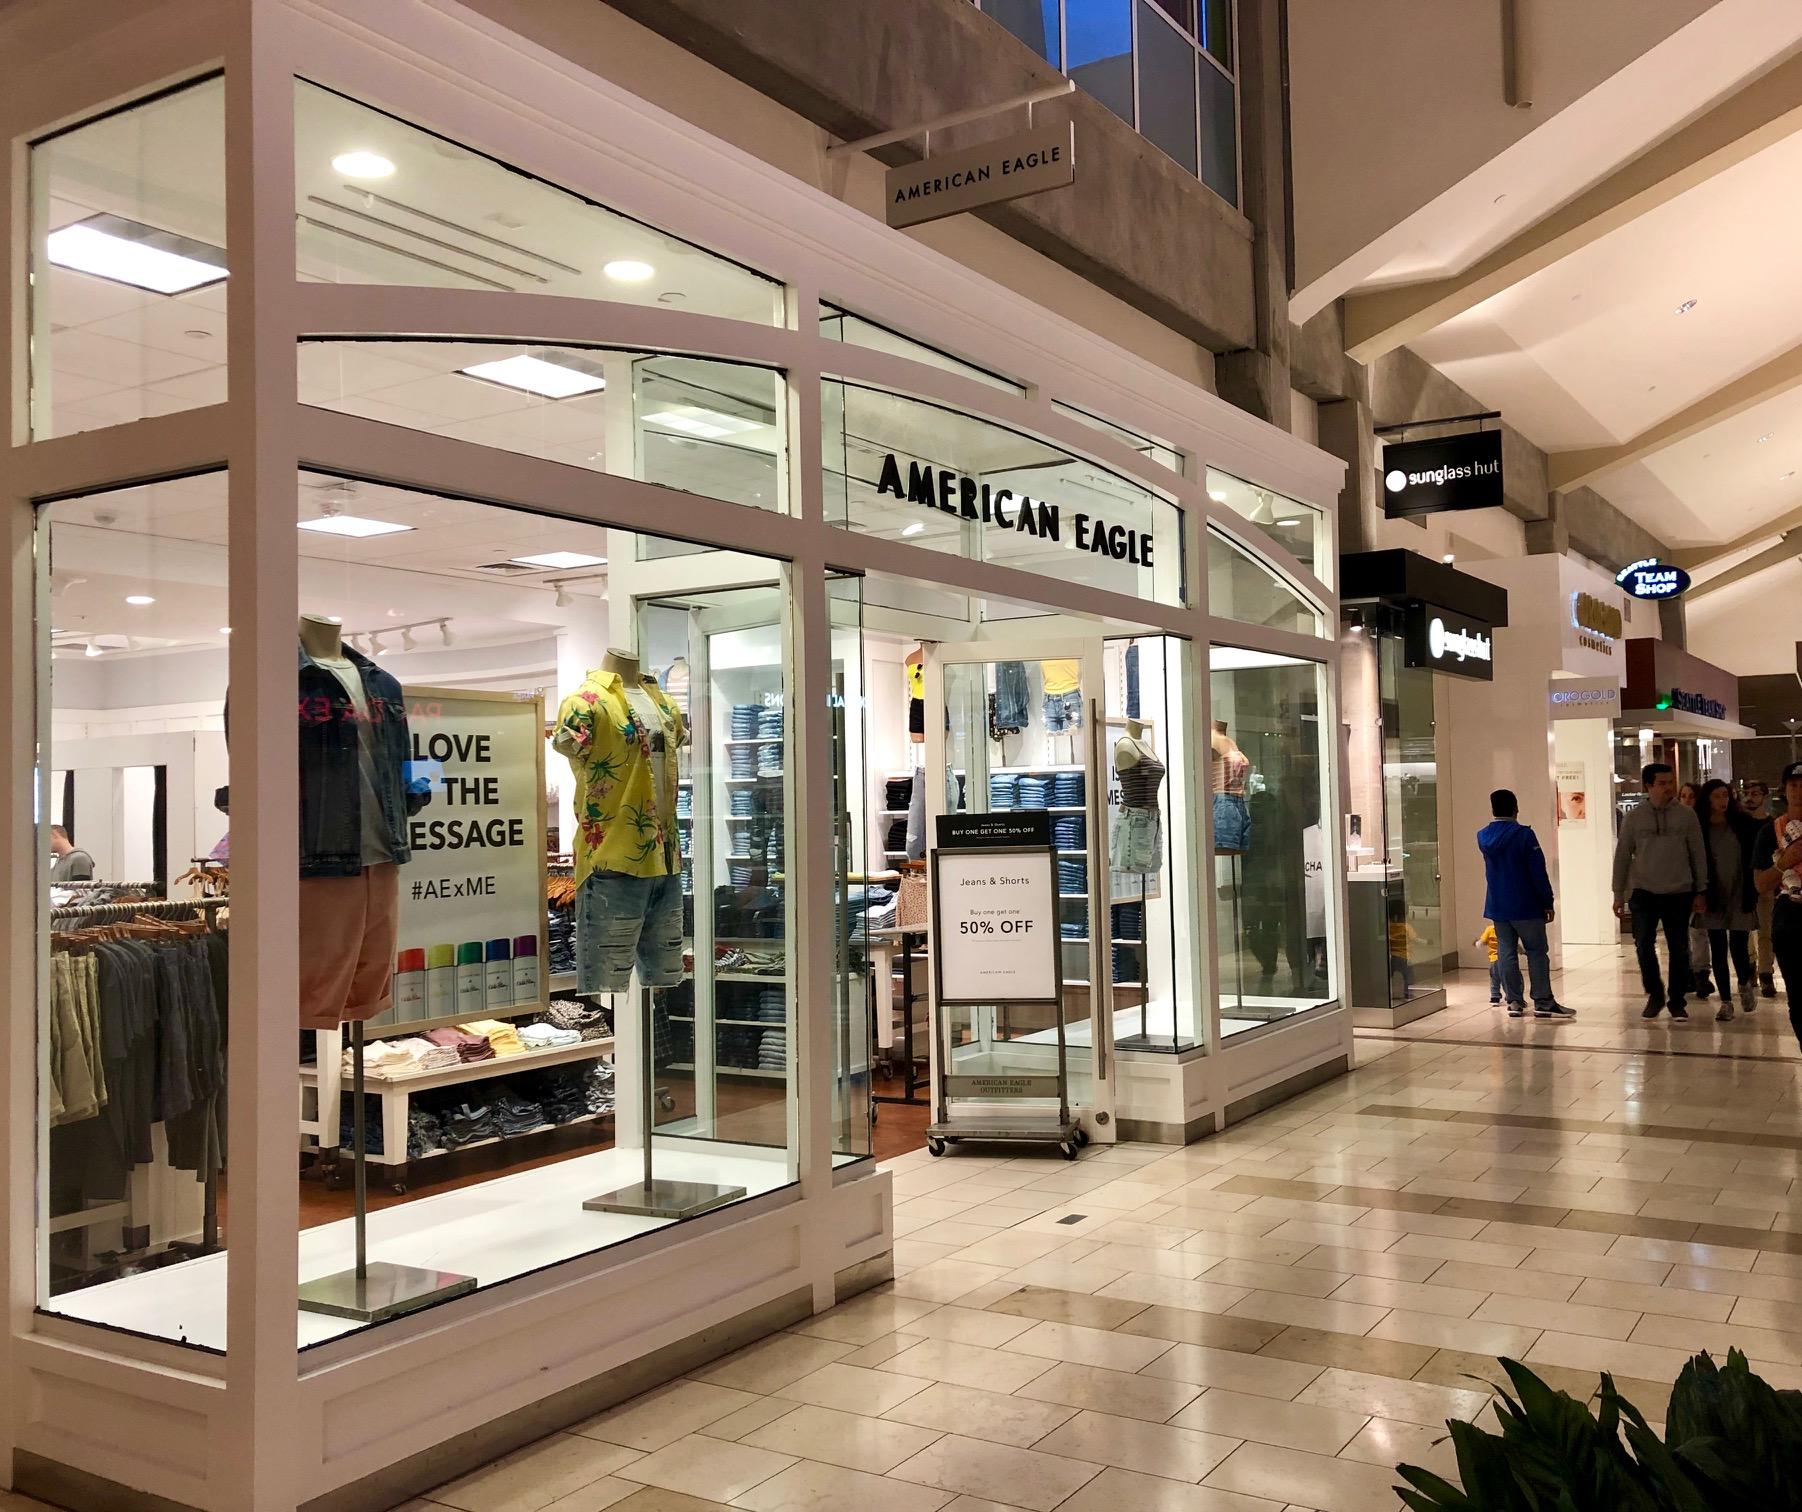 June 2019 Bellevue Square Updates: American Eagle, Peloton